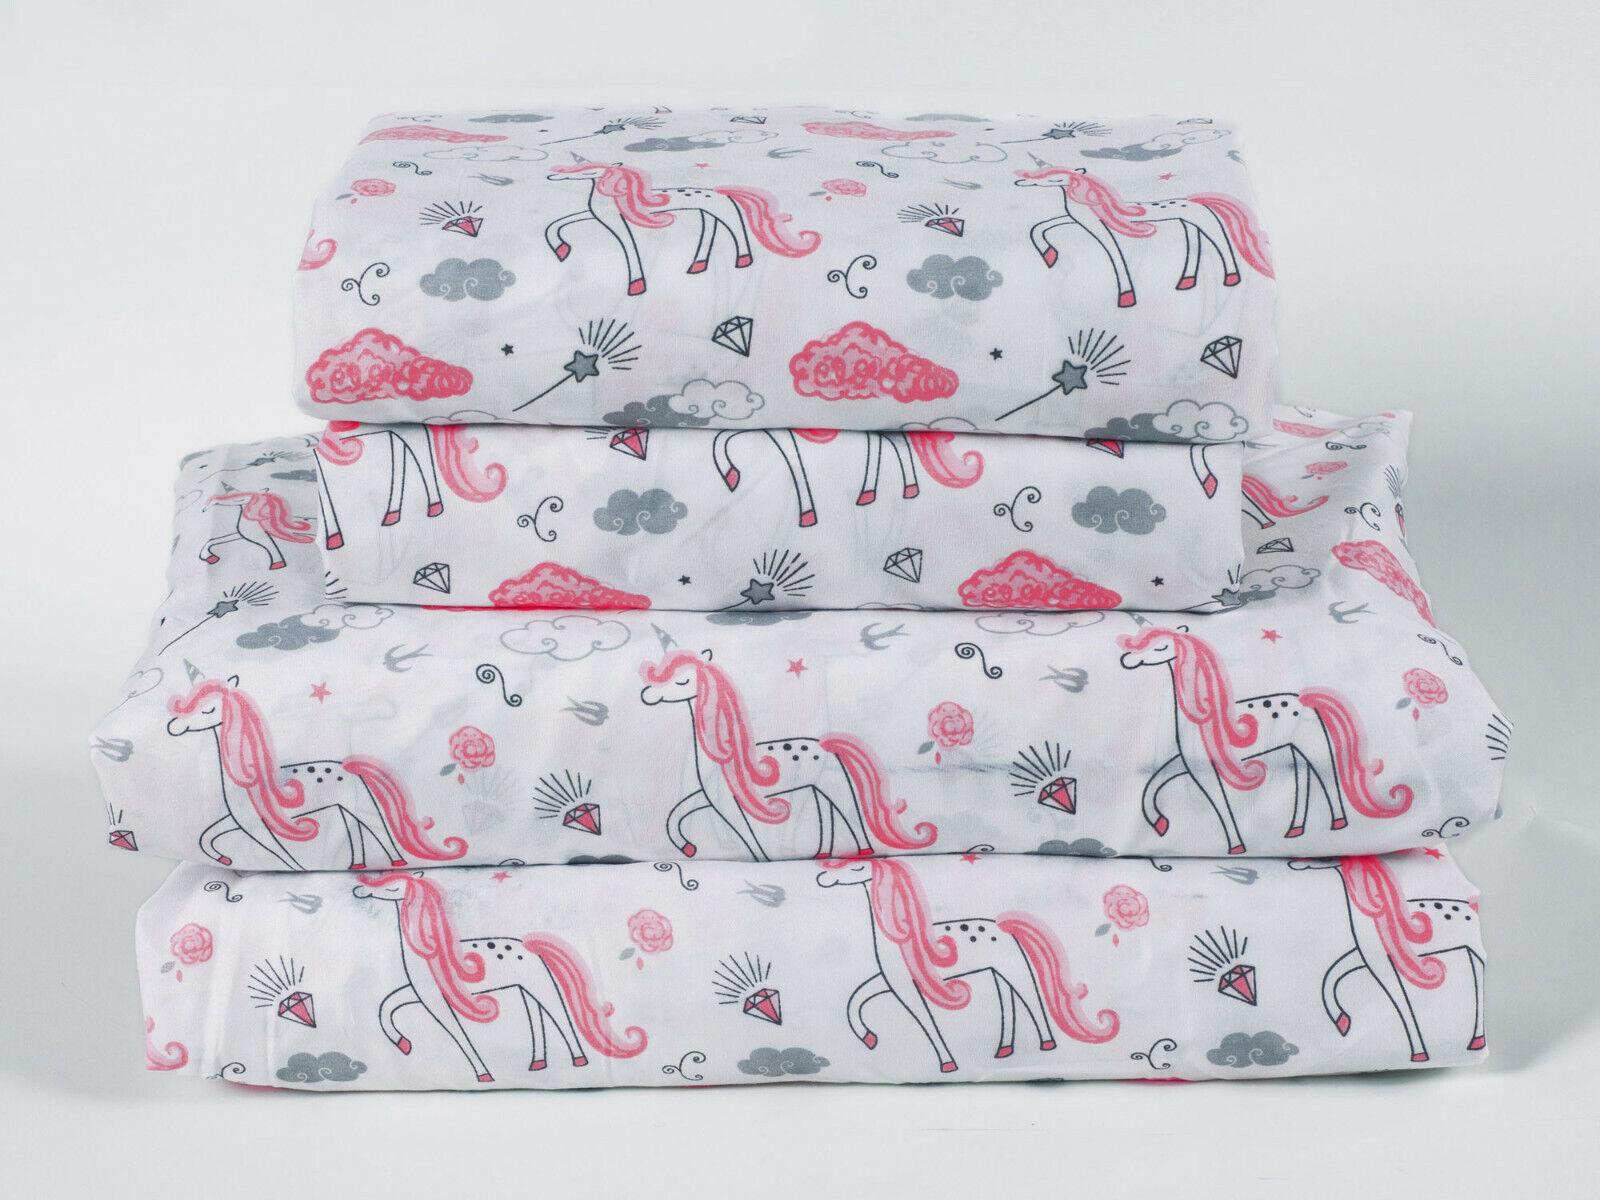 Microfiber Kid's Unicorn Sheet Set Girls, Pink, Grey, Stars, Clouds Bedding